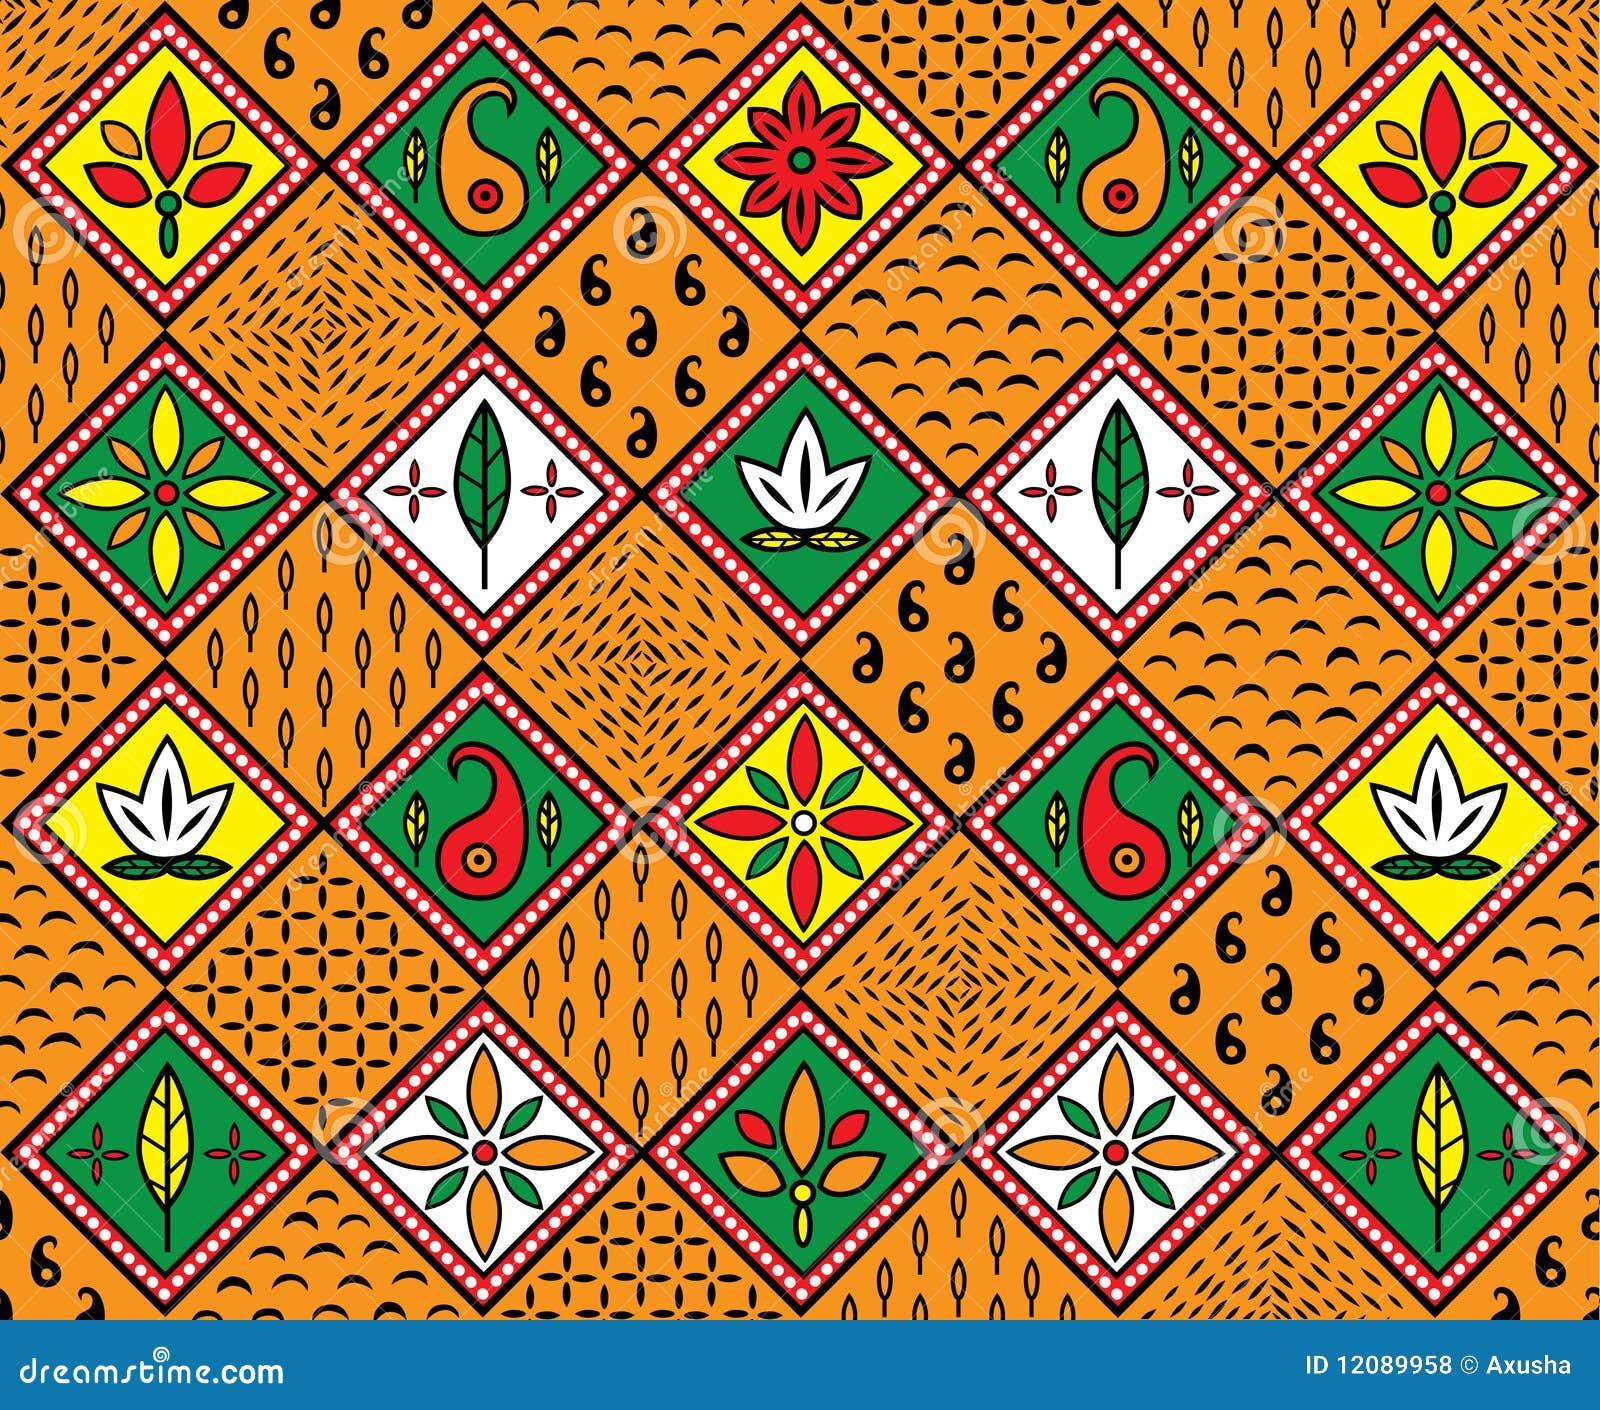 afrikanisches muster lizenzfreie stockfotos bild 12089958. Black Bedroom Furniture Sets. Home Design Ideas